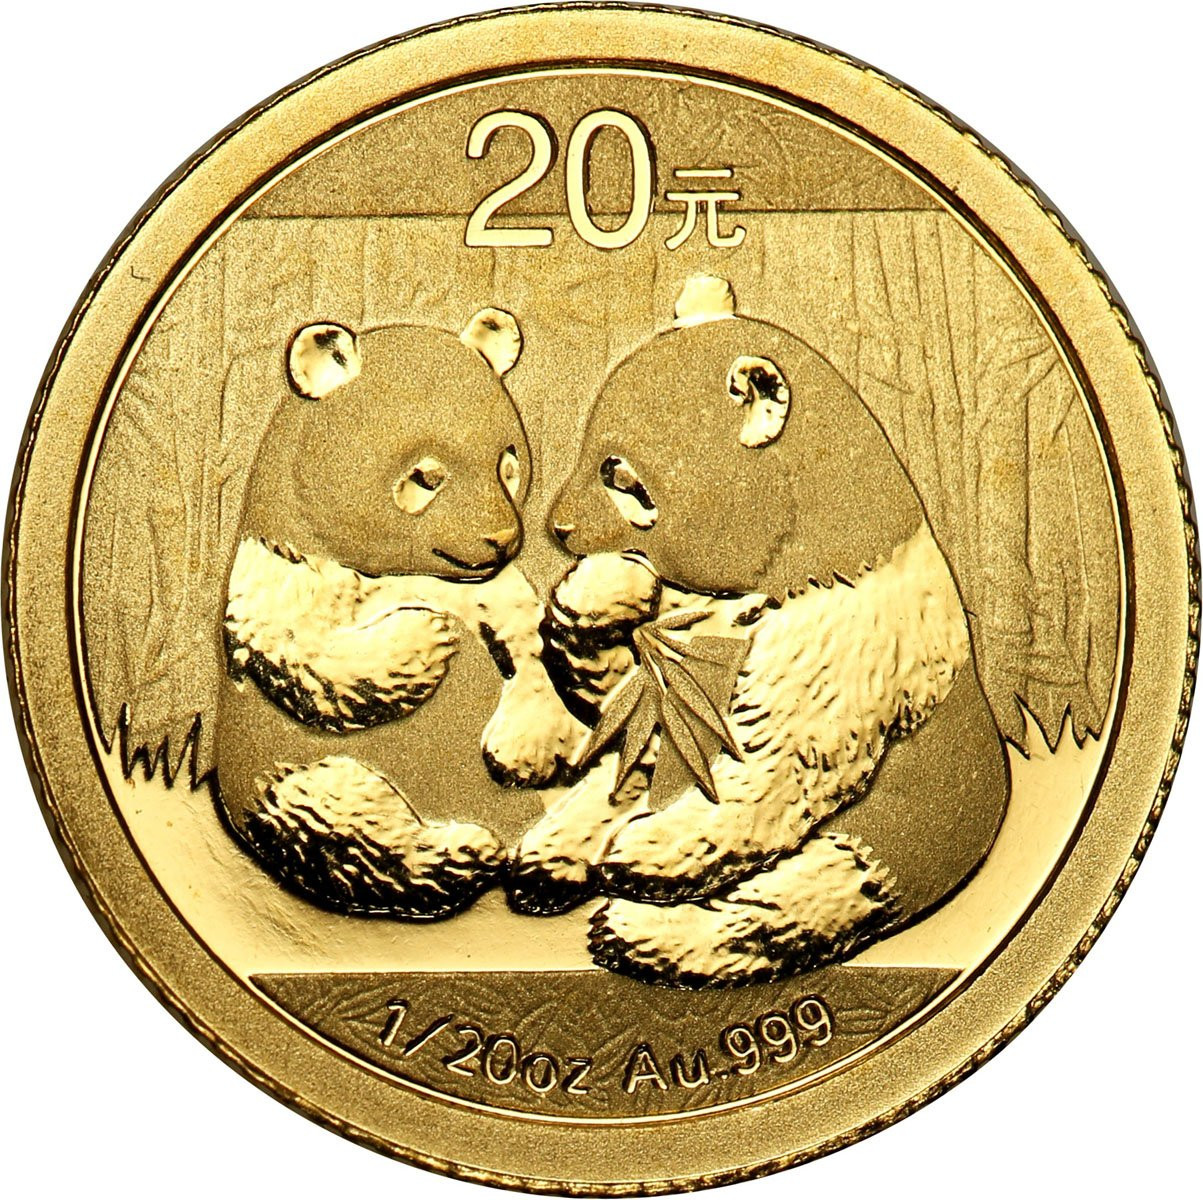 Chiny 20 Yuan 2009 Panda (1/20 uncji Au) st. L